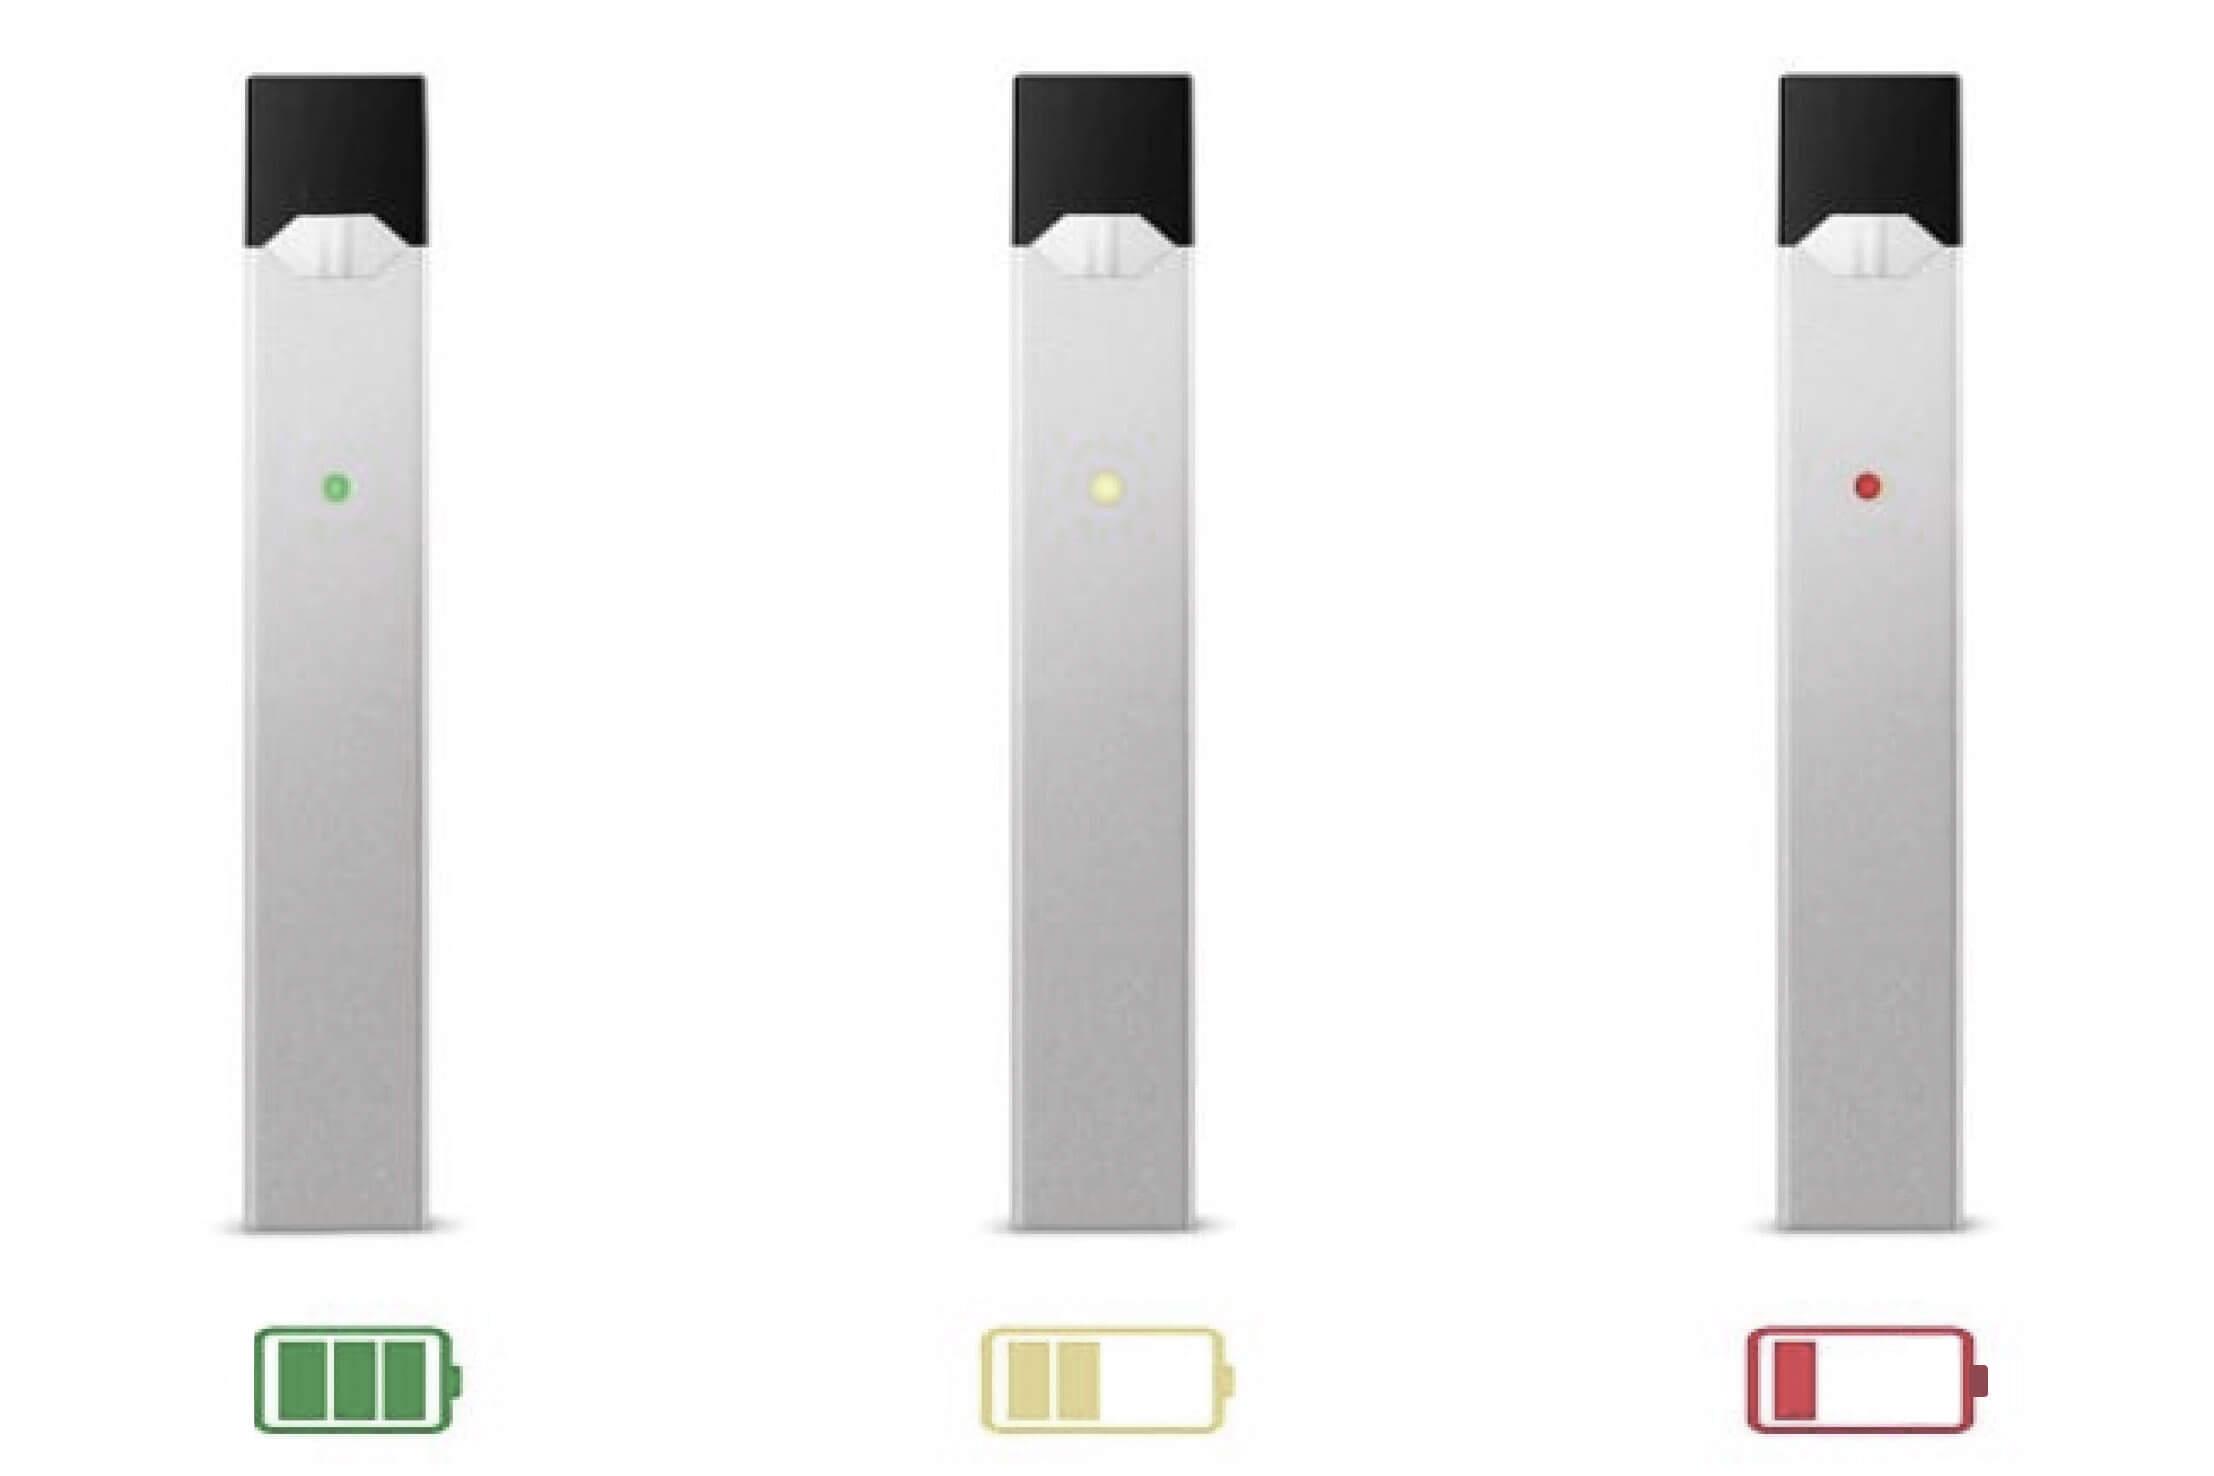 Juul Battery: How Do I Do To Use Safety? | Vapepenzone